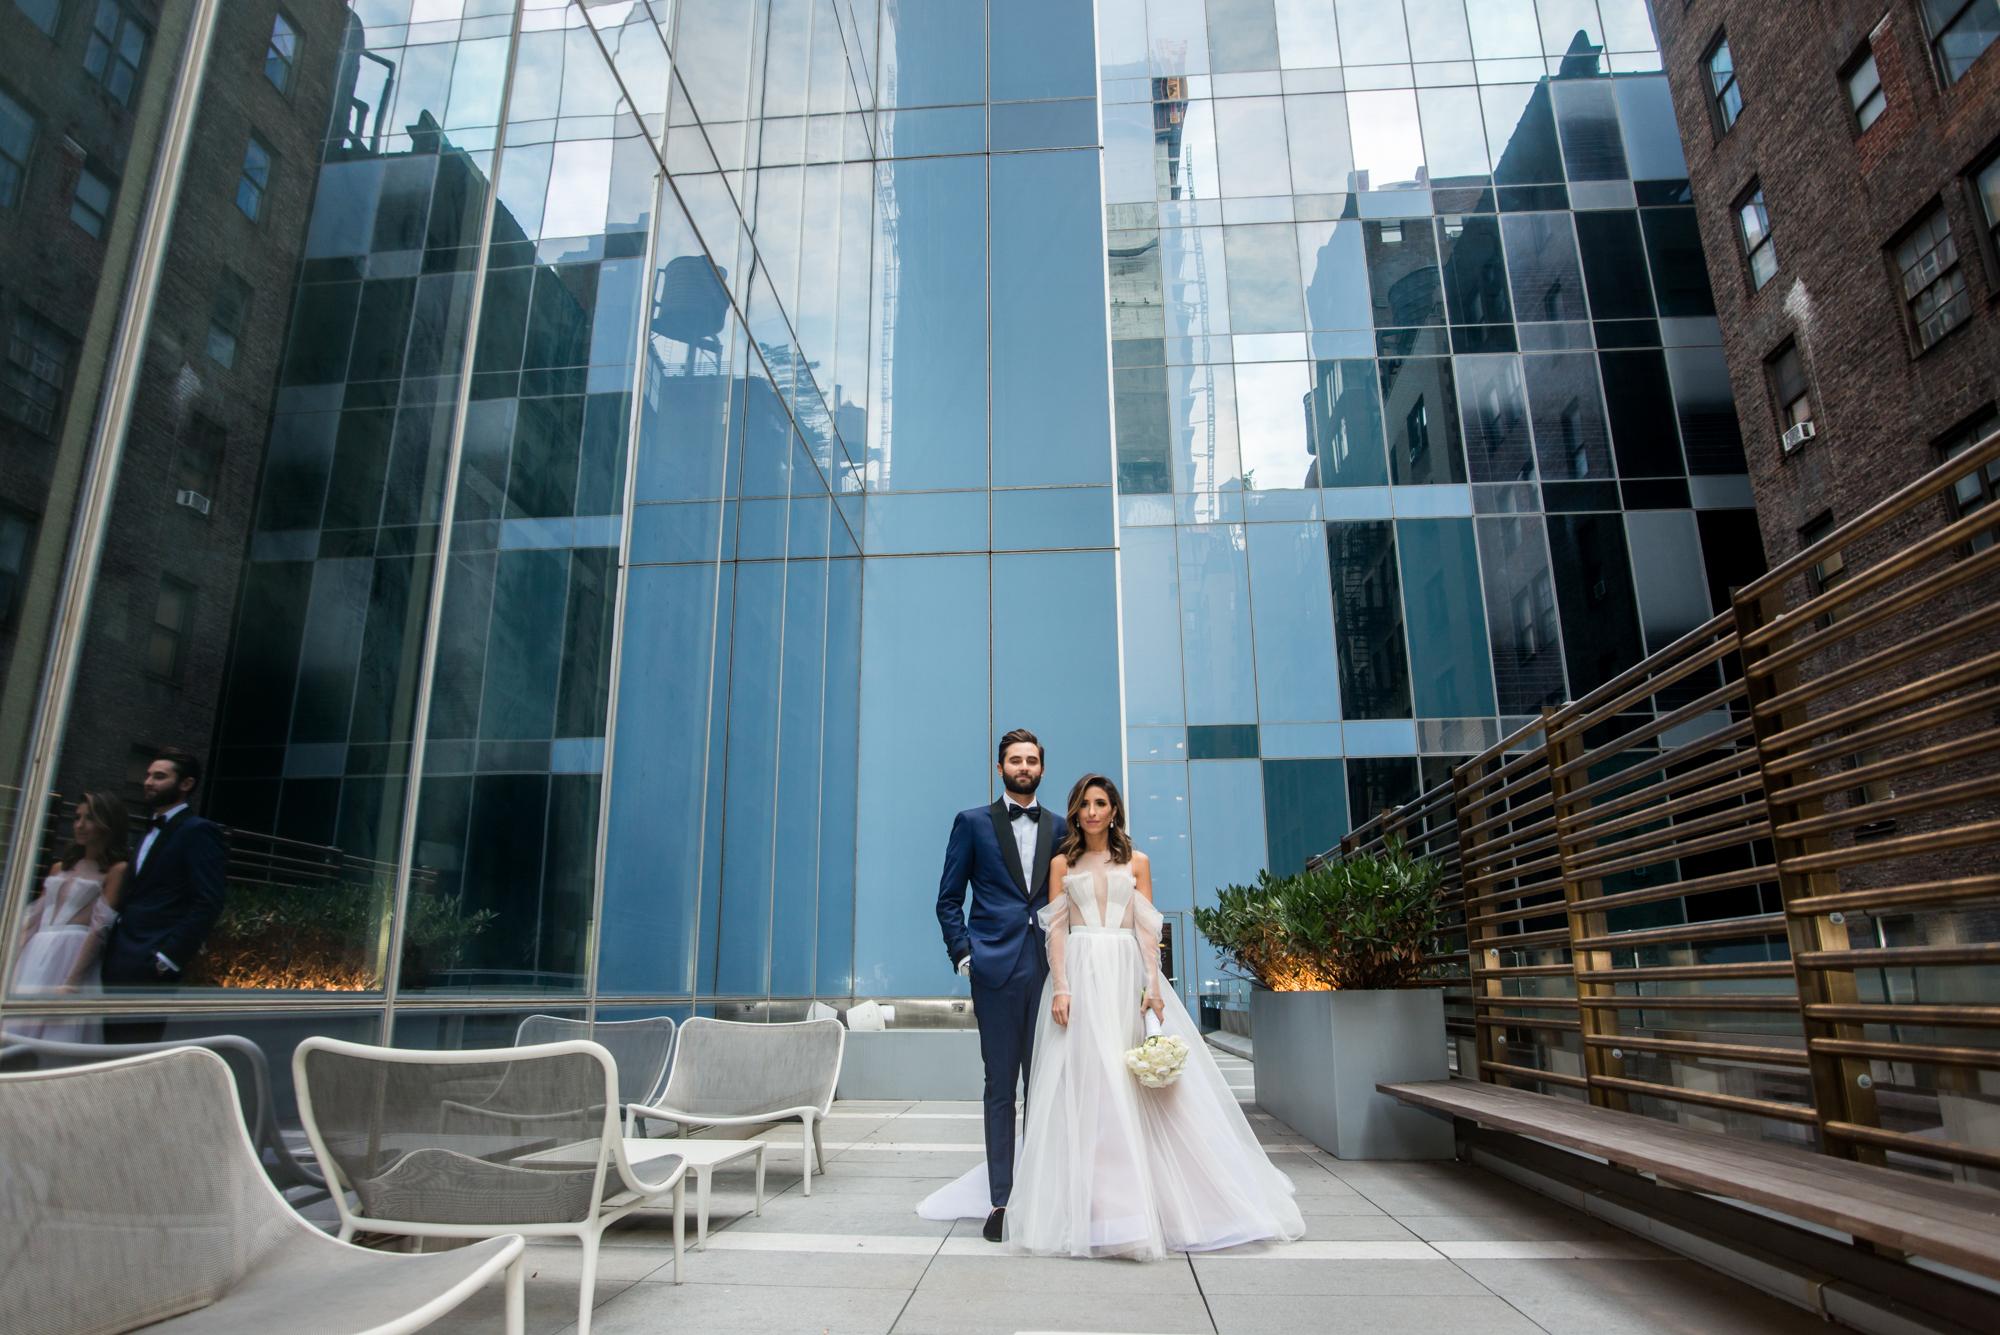 terri-diamond-photography-wedding_1635.jpg